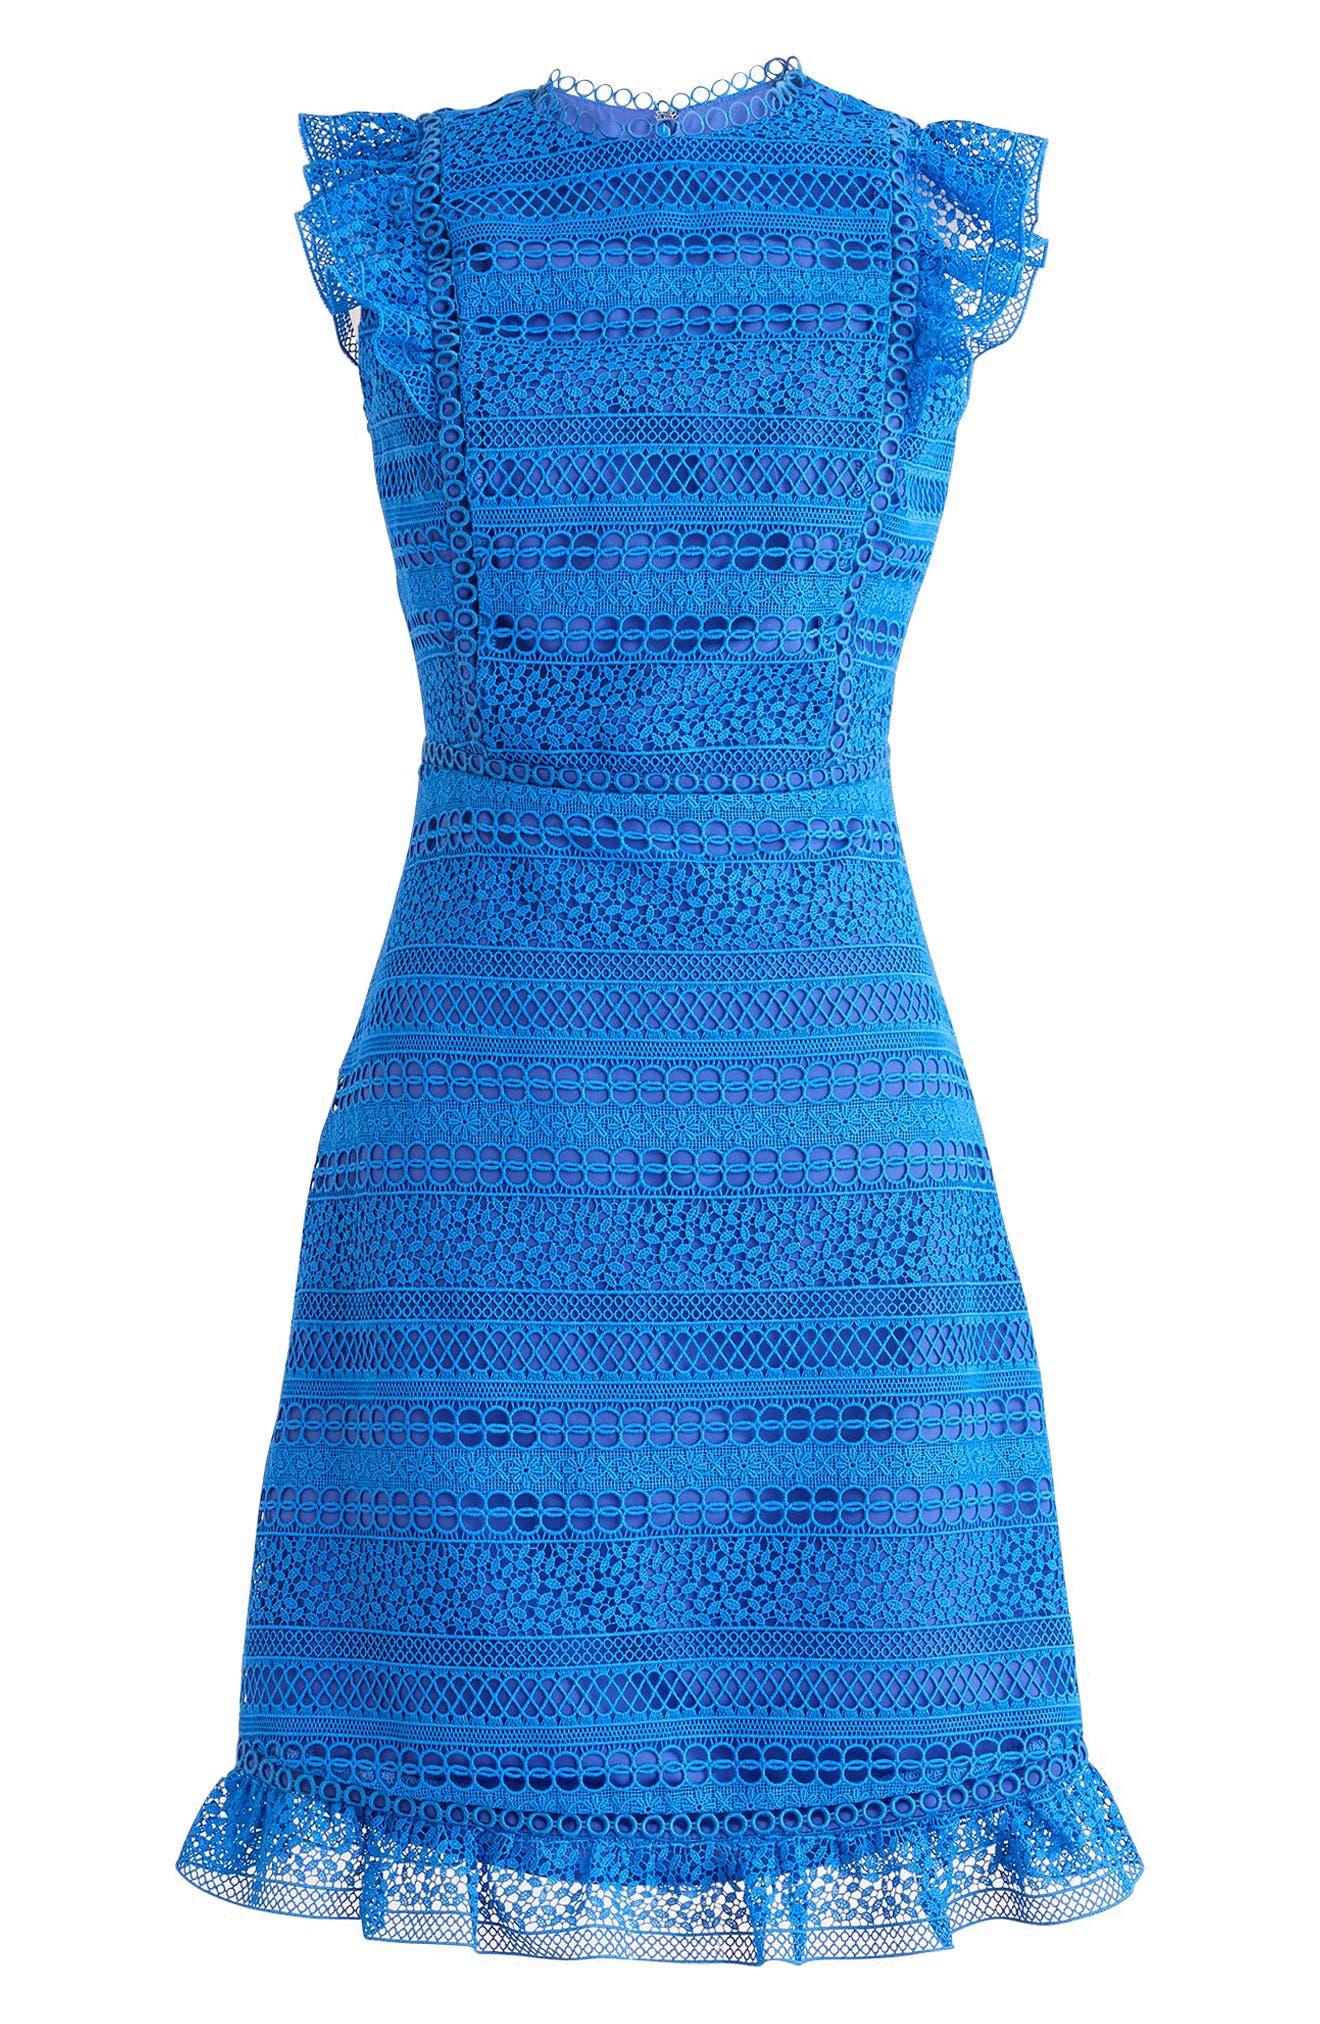 J.Crew Cap Sleeve Ruffle Lace Dress,                             Main thumbnail 1, color,                             Mediterranean Coast